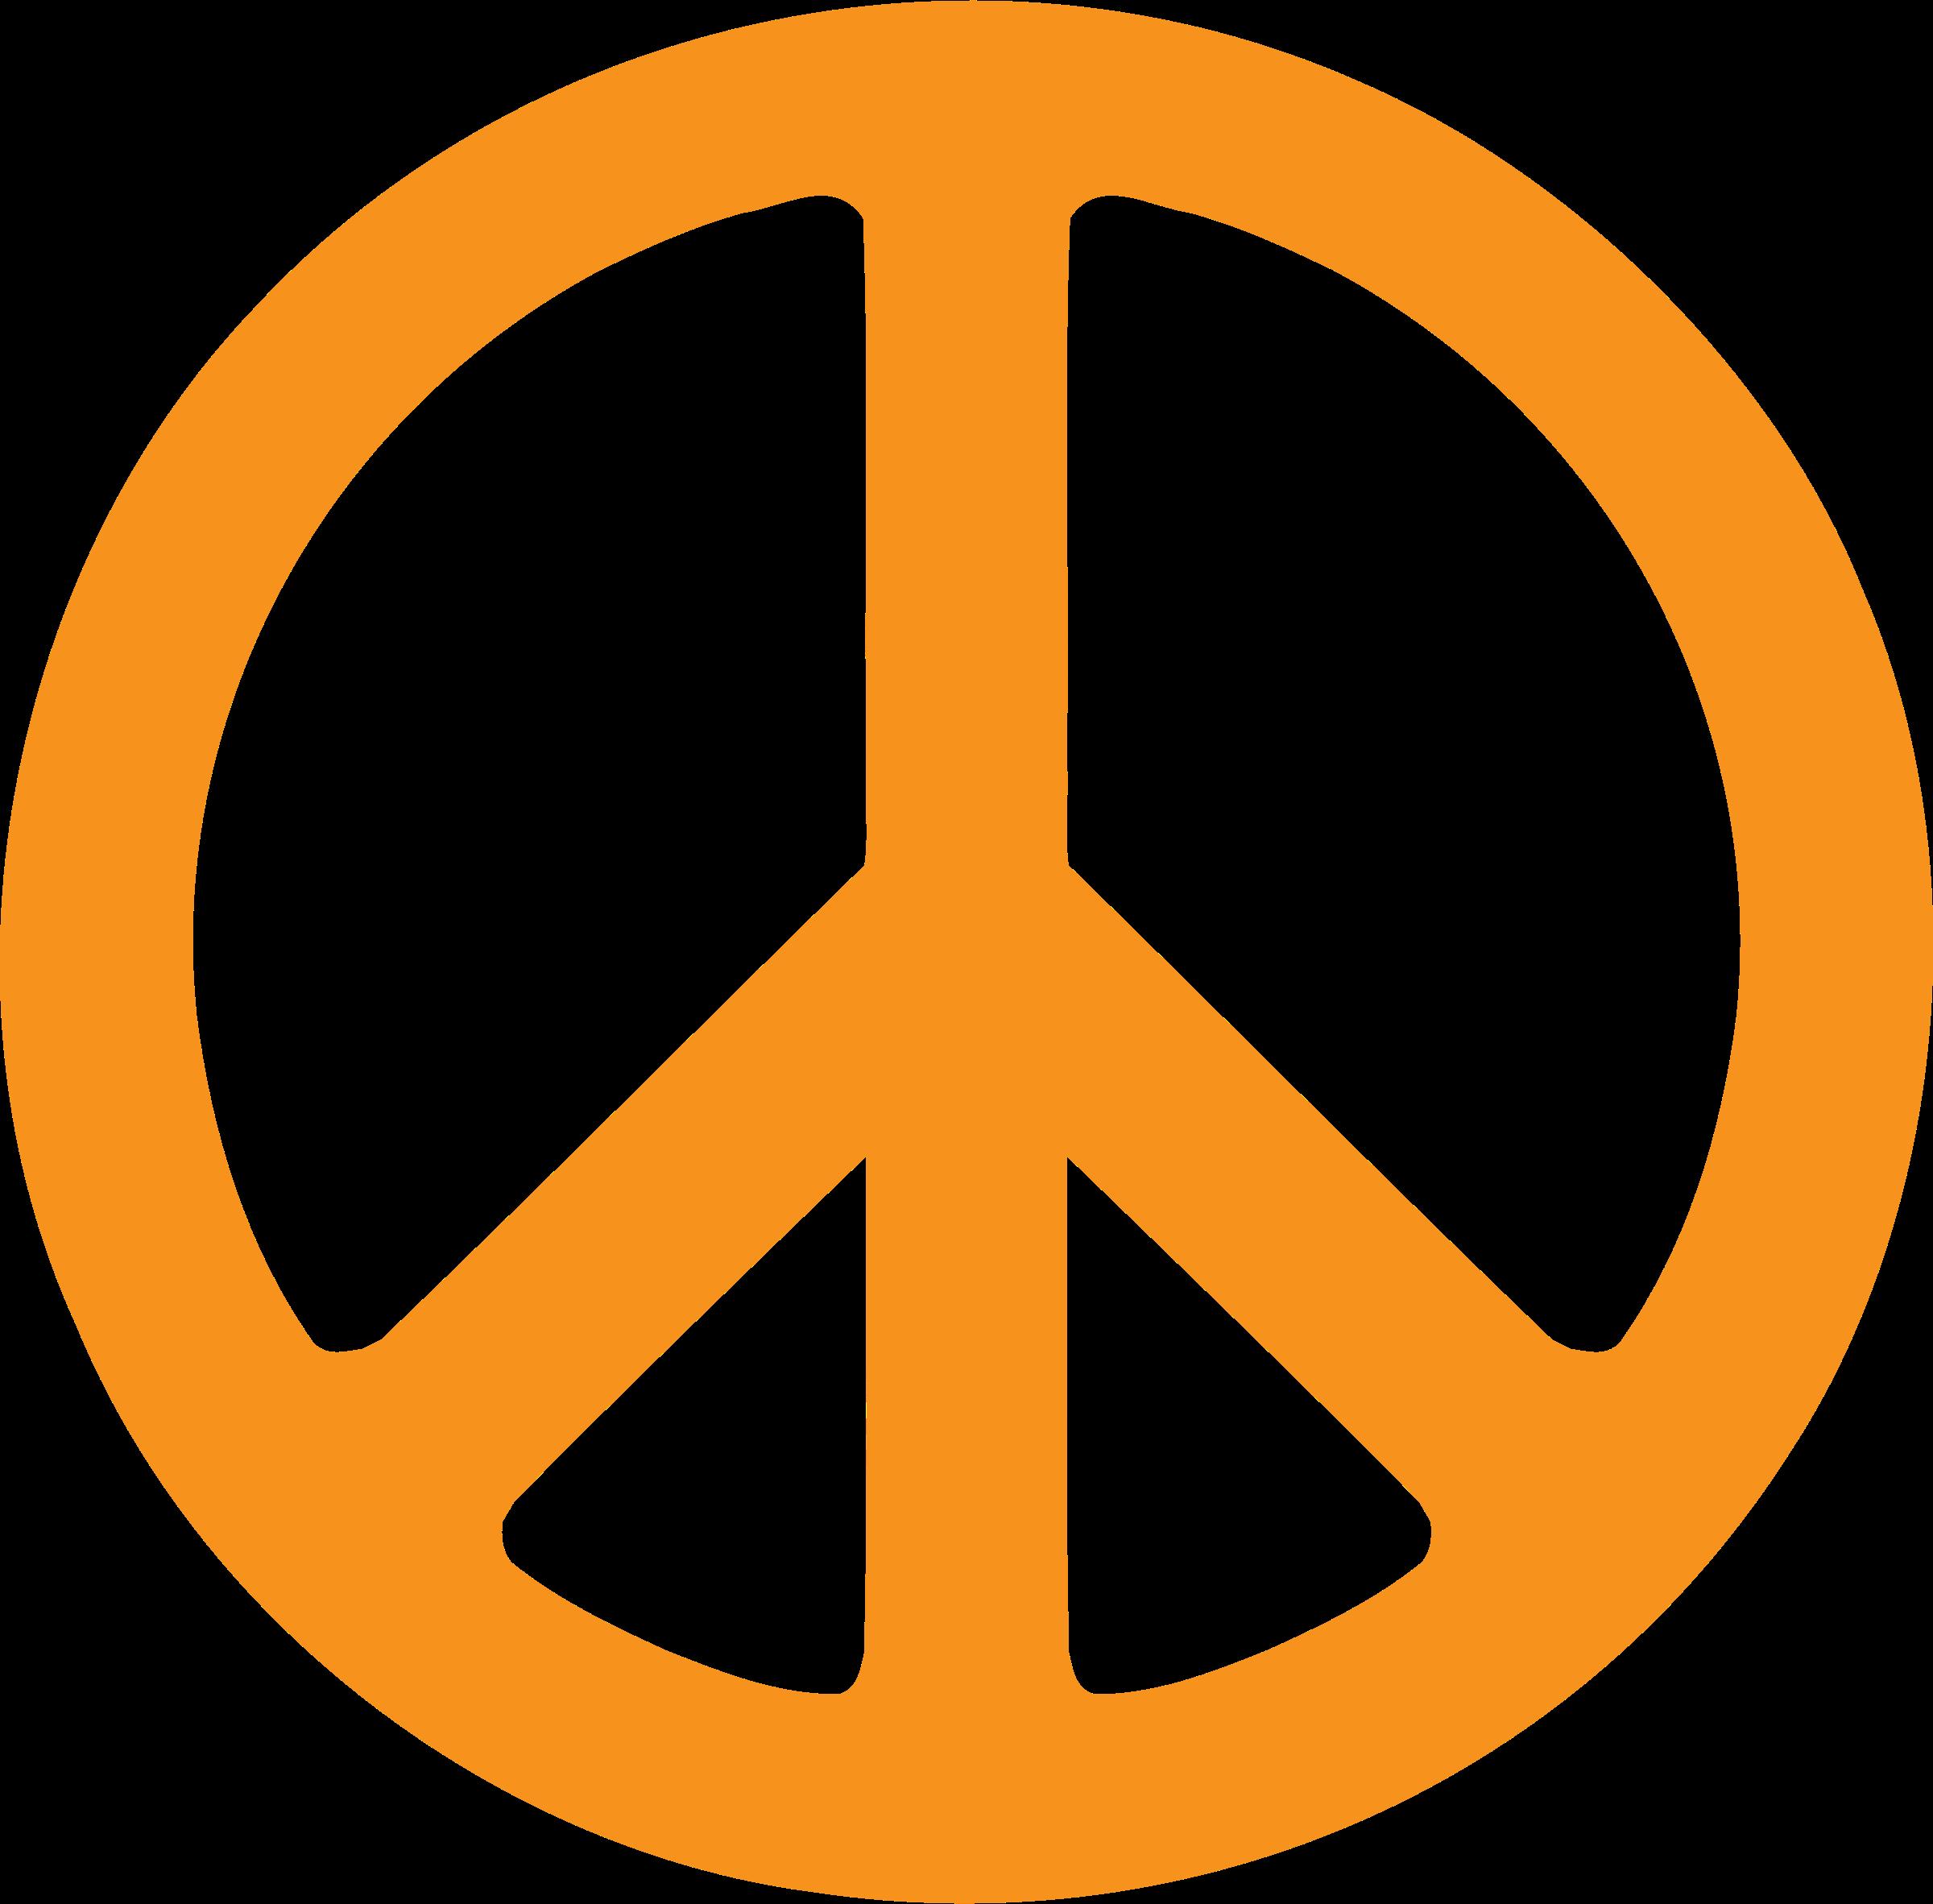 Zebra clipart peace sign Transparent Symbol Peace PNG Symbol